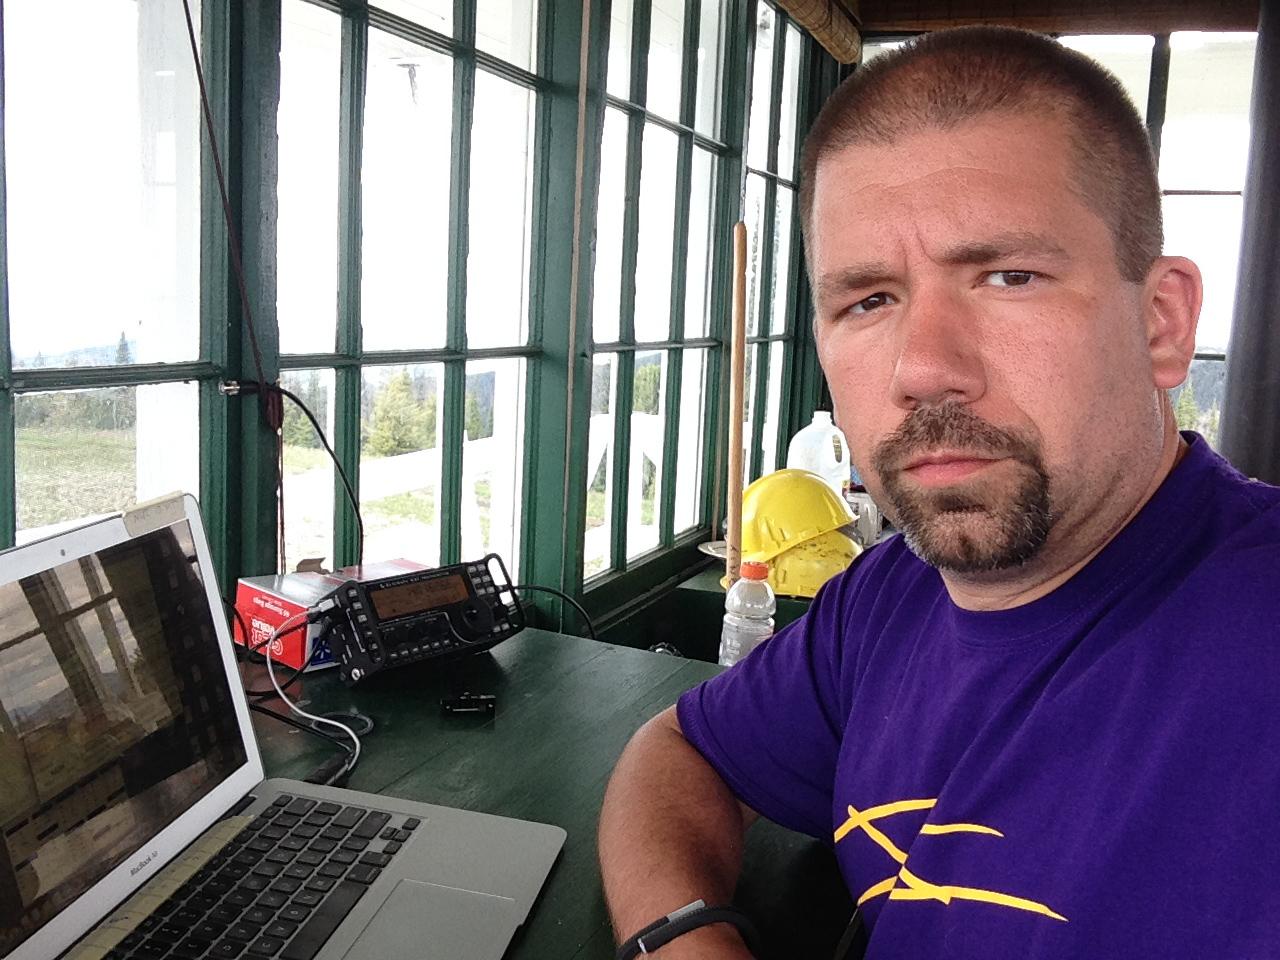 John getting ready to operate CW